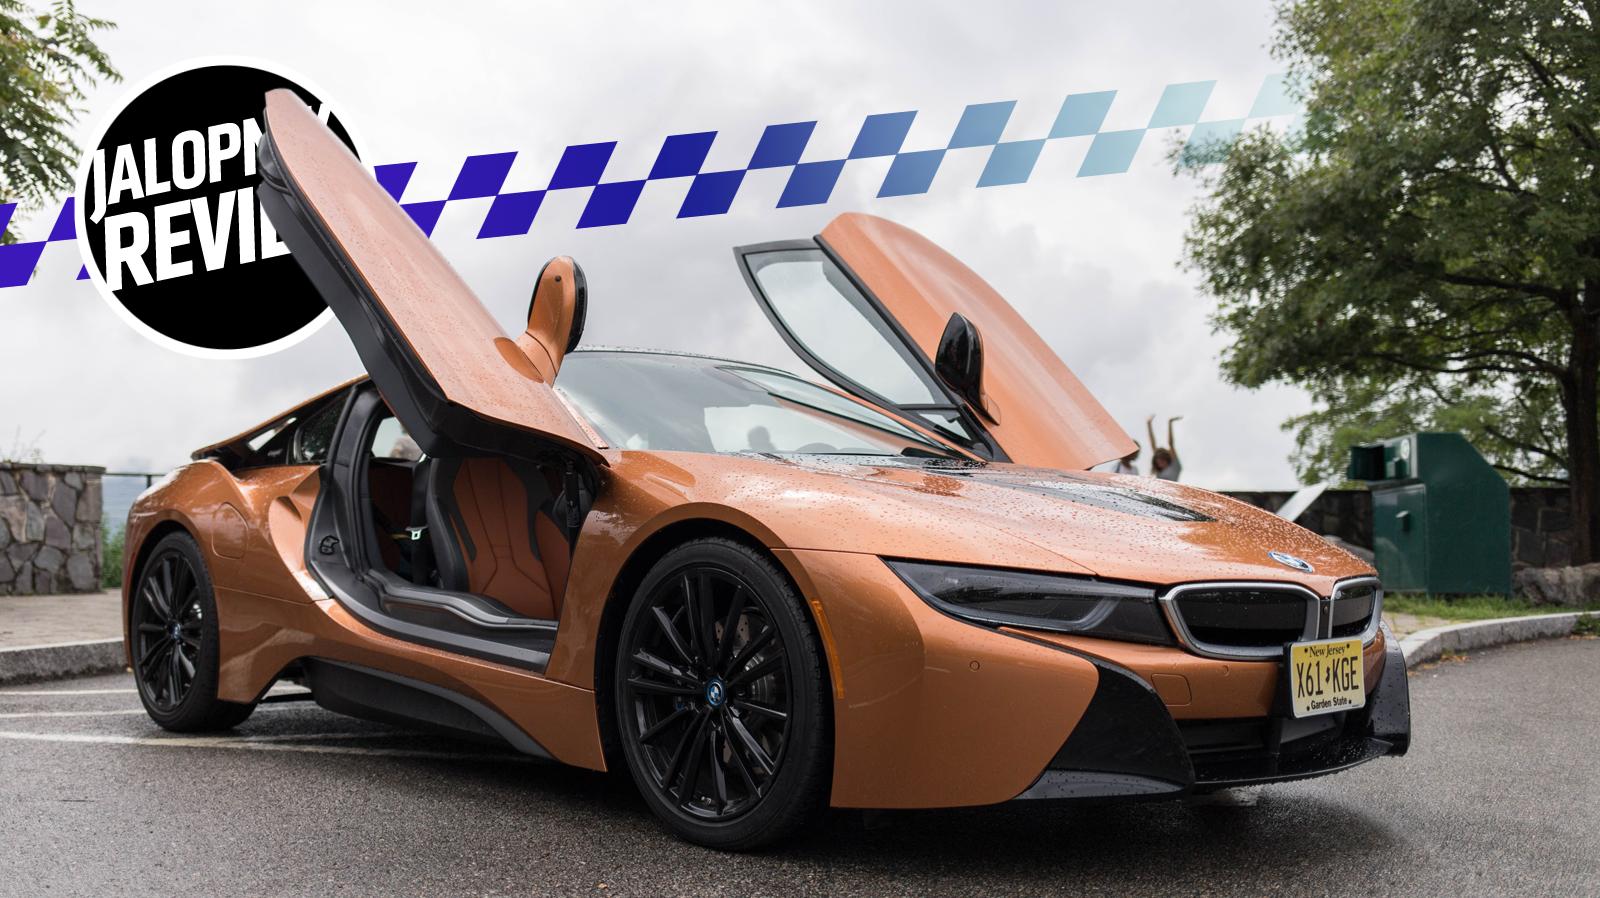 2019 BMW i8: I Am a Big Dumb Idiot for Thinking It Needed